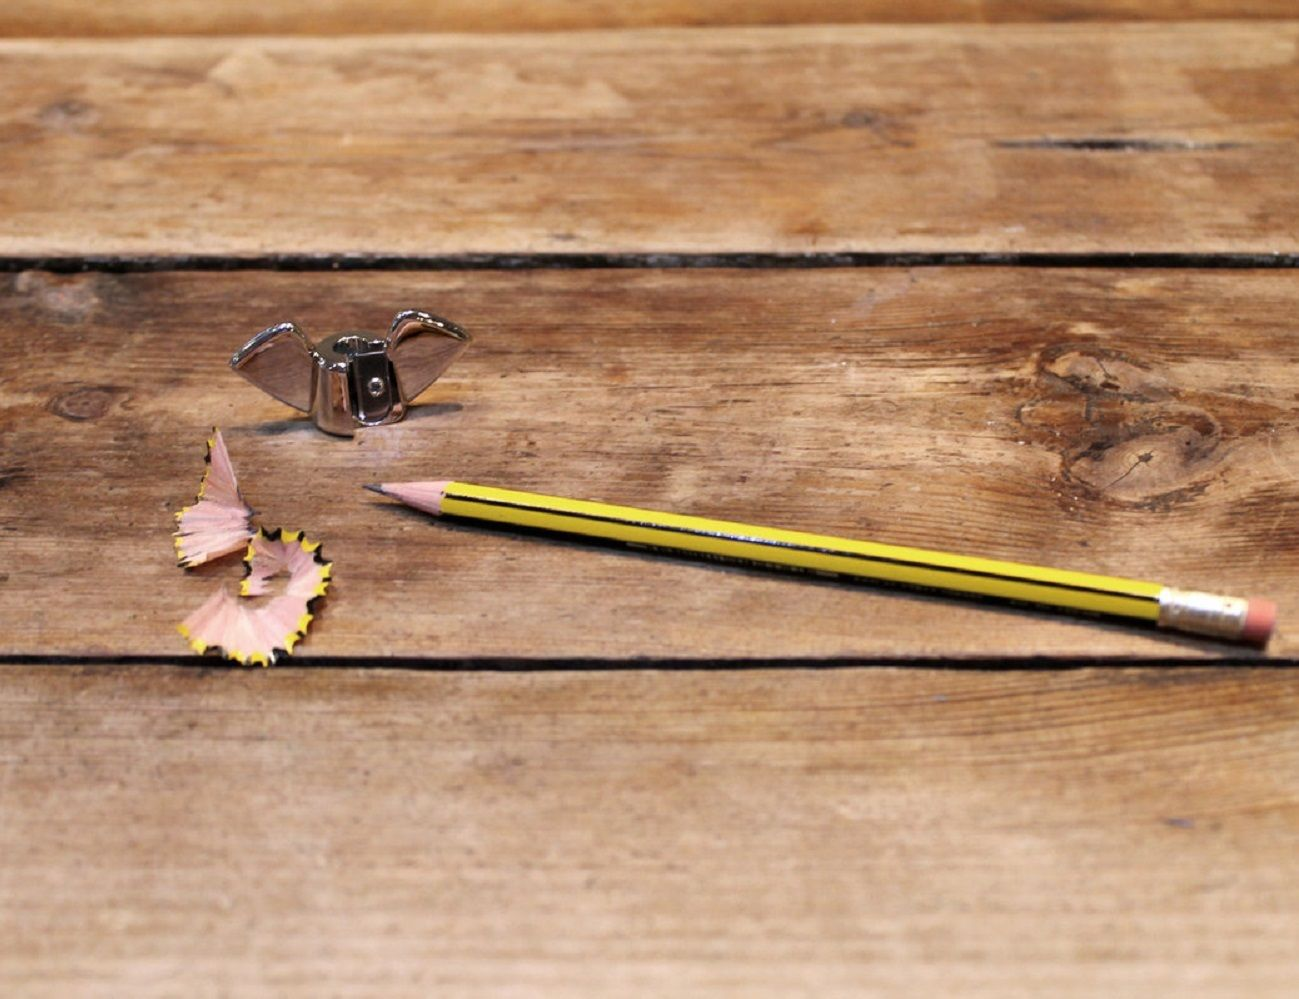 Wing Nut Design Pencil Sharpener by SUCK UK